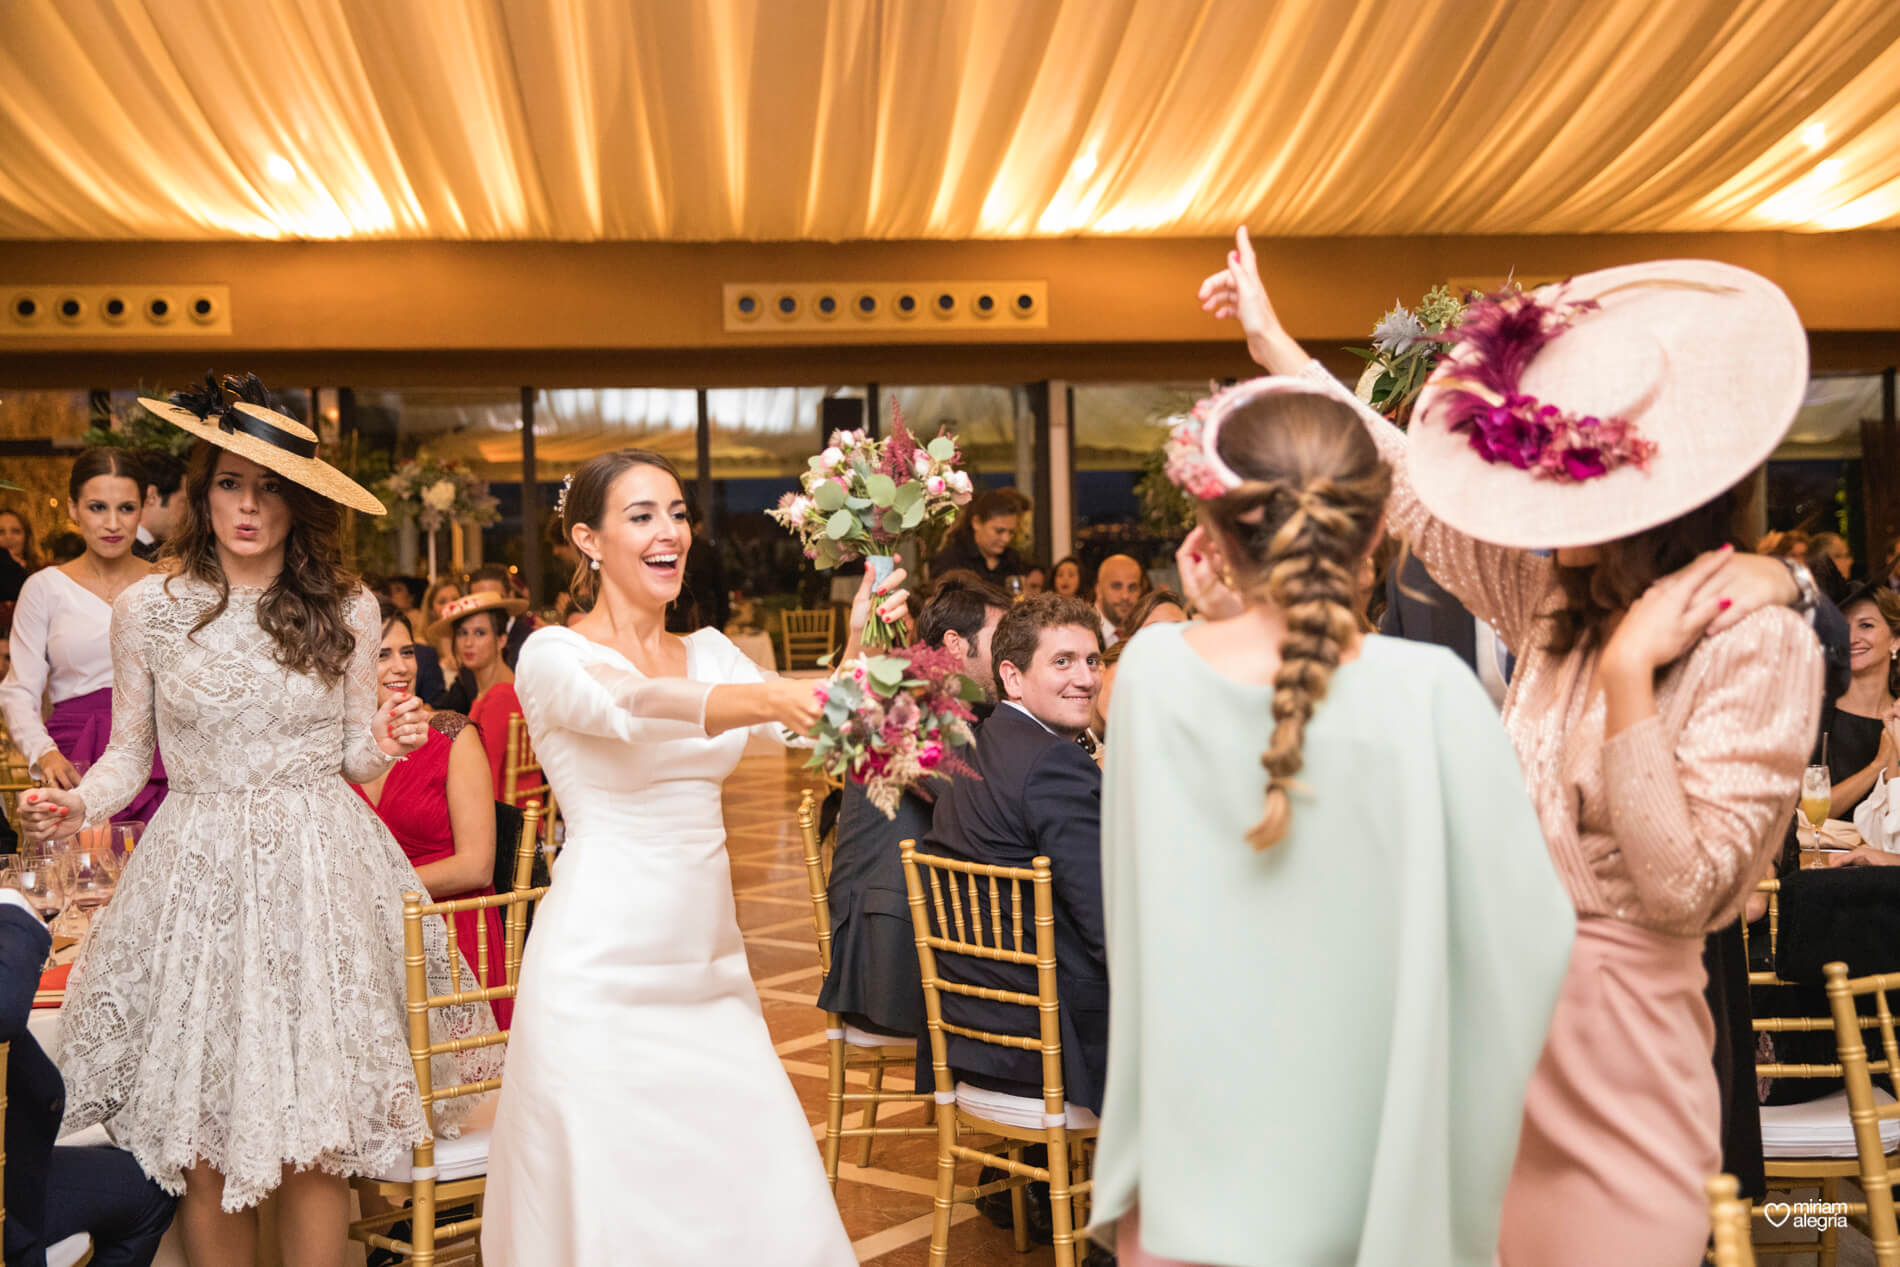 vestido-de-novia-paula-del-vas-miriam-alegria-fotografos-boda-murcia-129